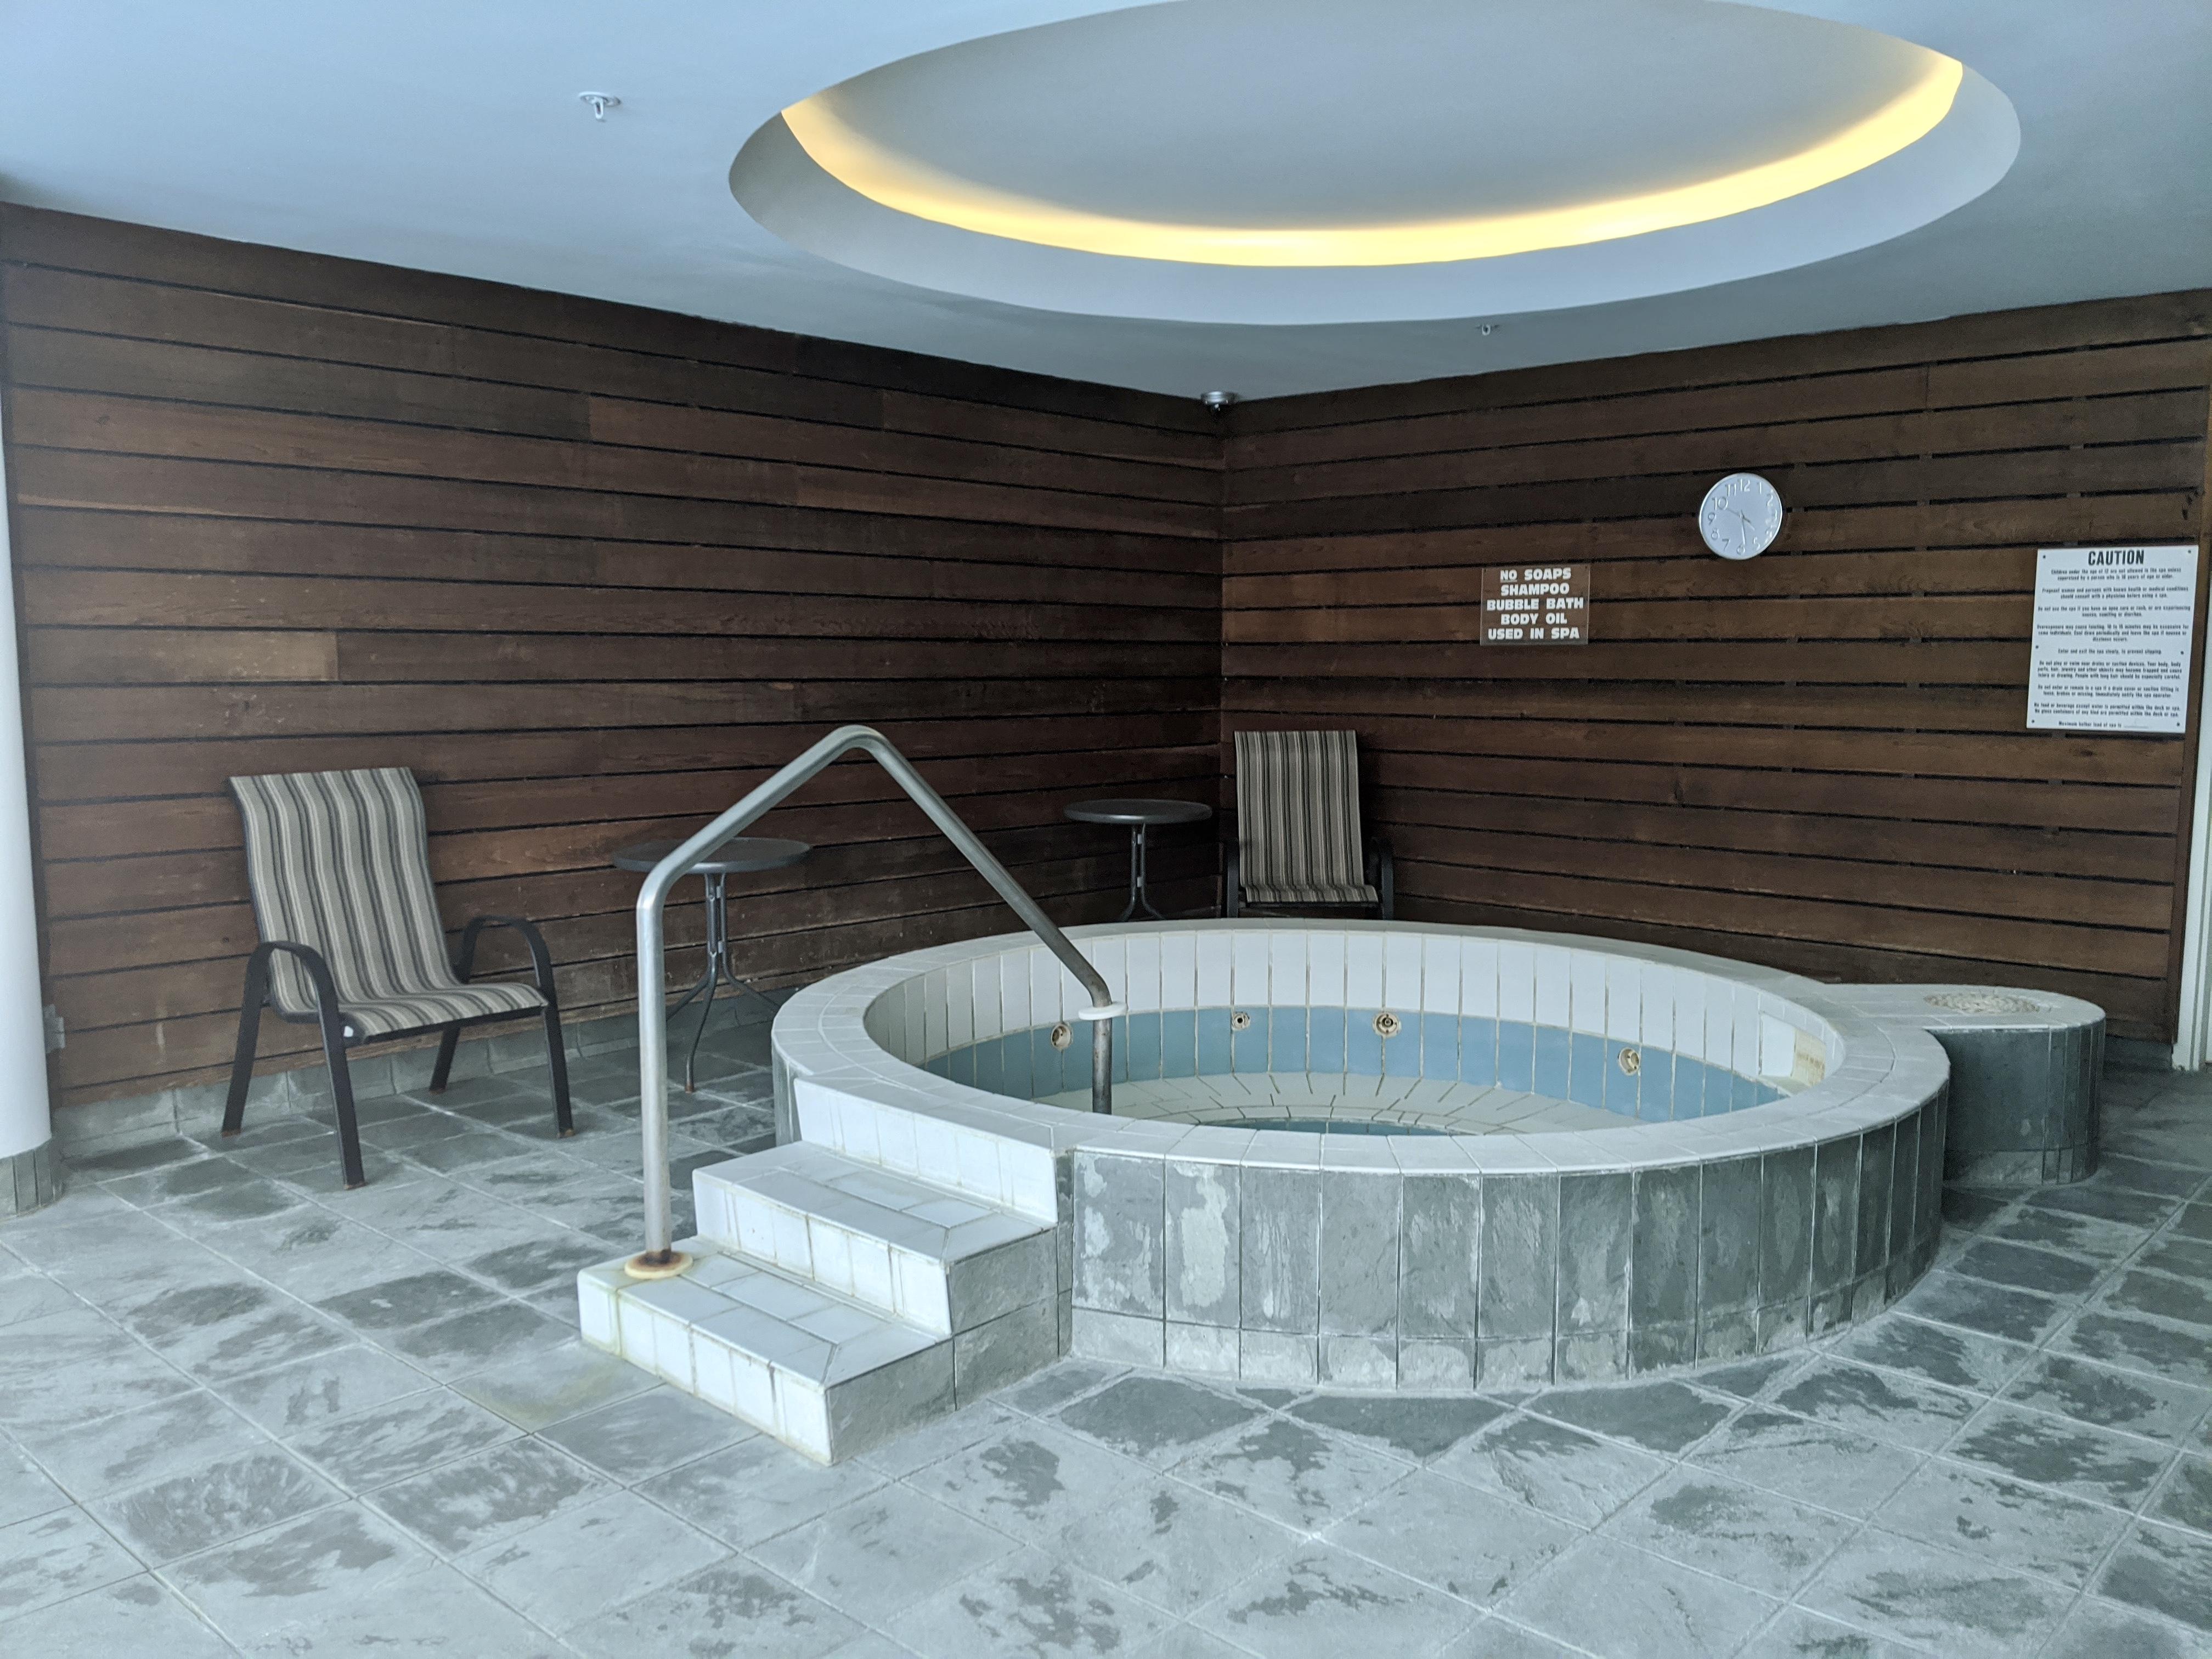 http://listingtour.s3-website-us-east-1.amazonaws.com/509---150-dunlop-street-e/IMG_20200915_162552.jpg